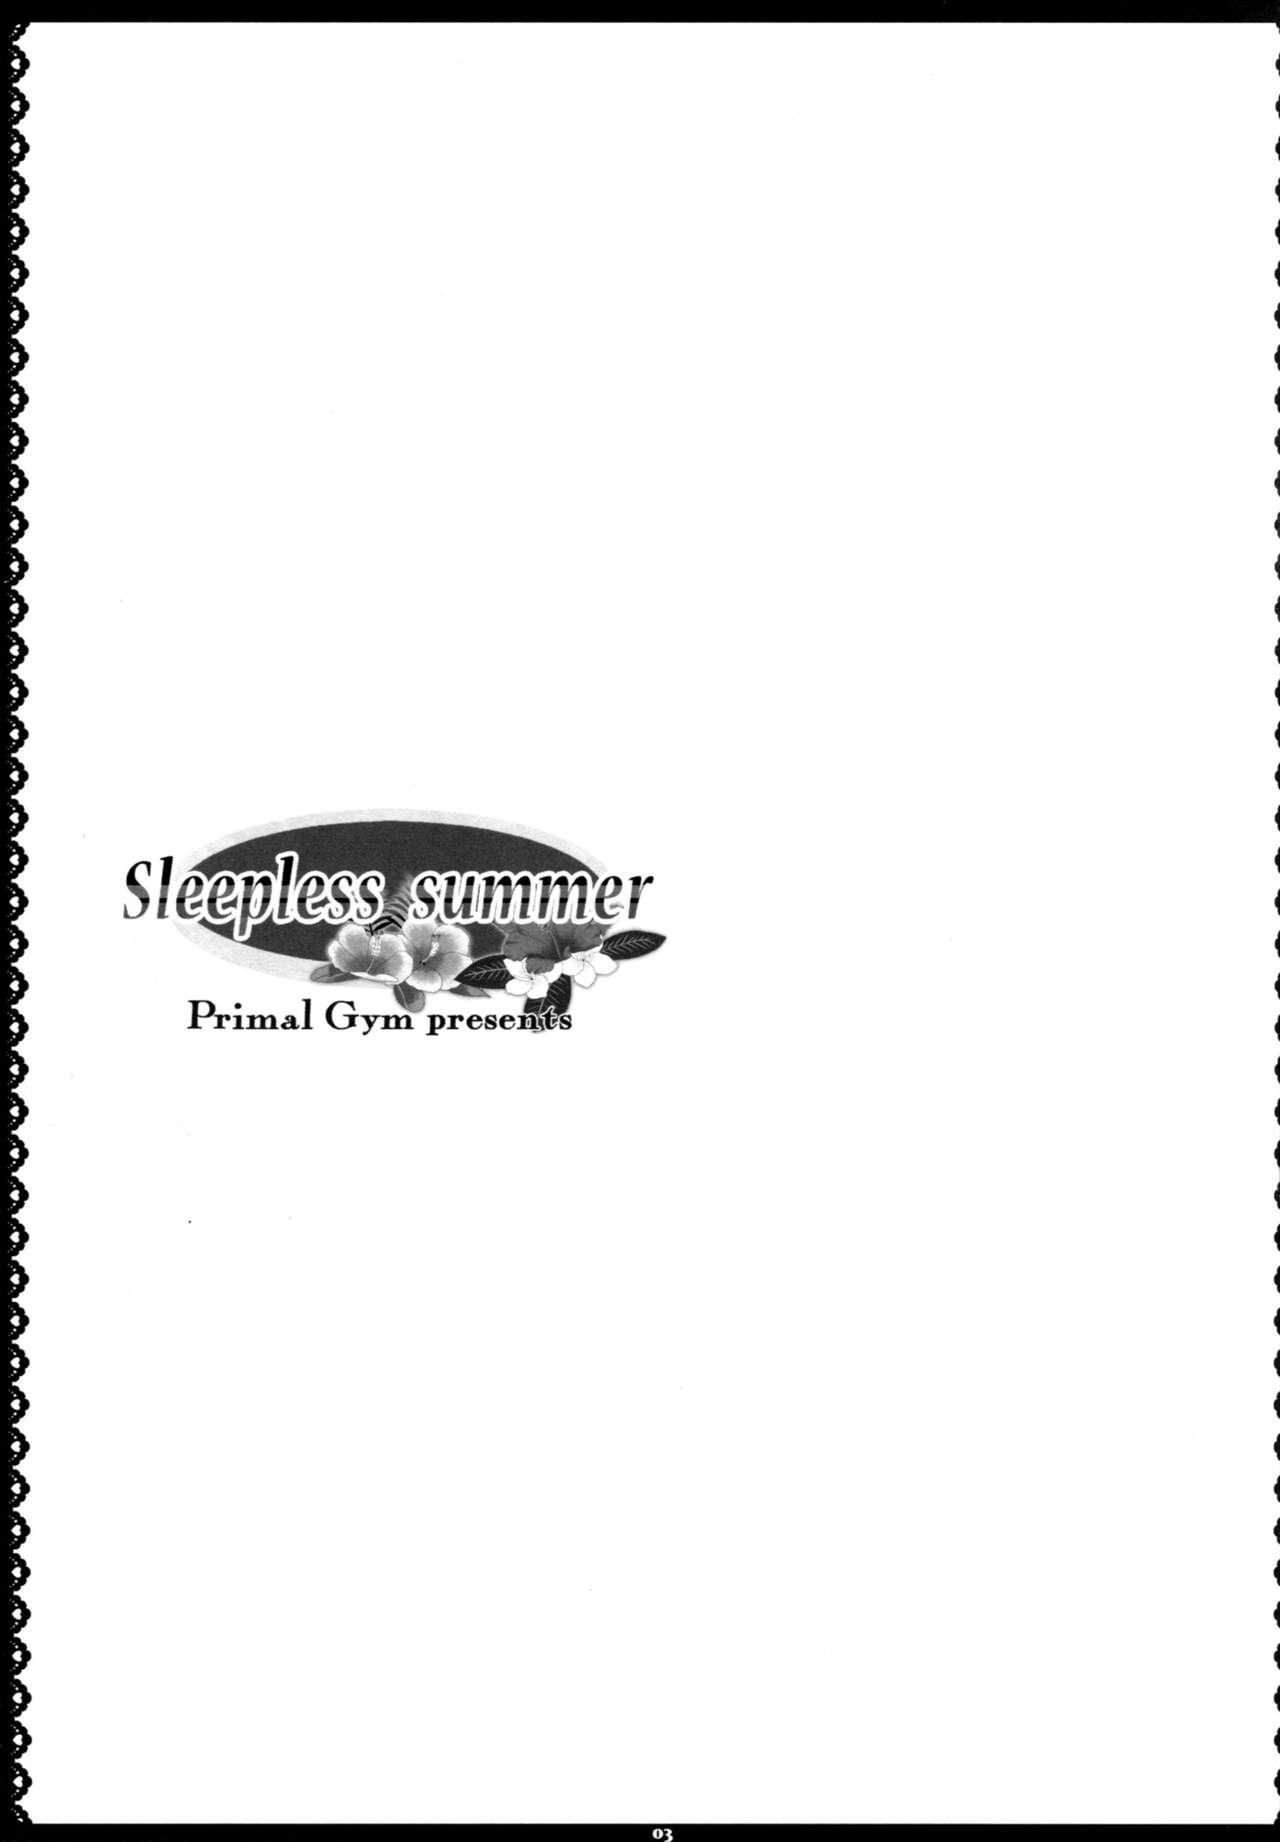 Sleepless summer 1